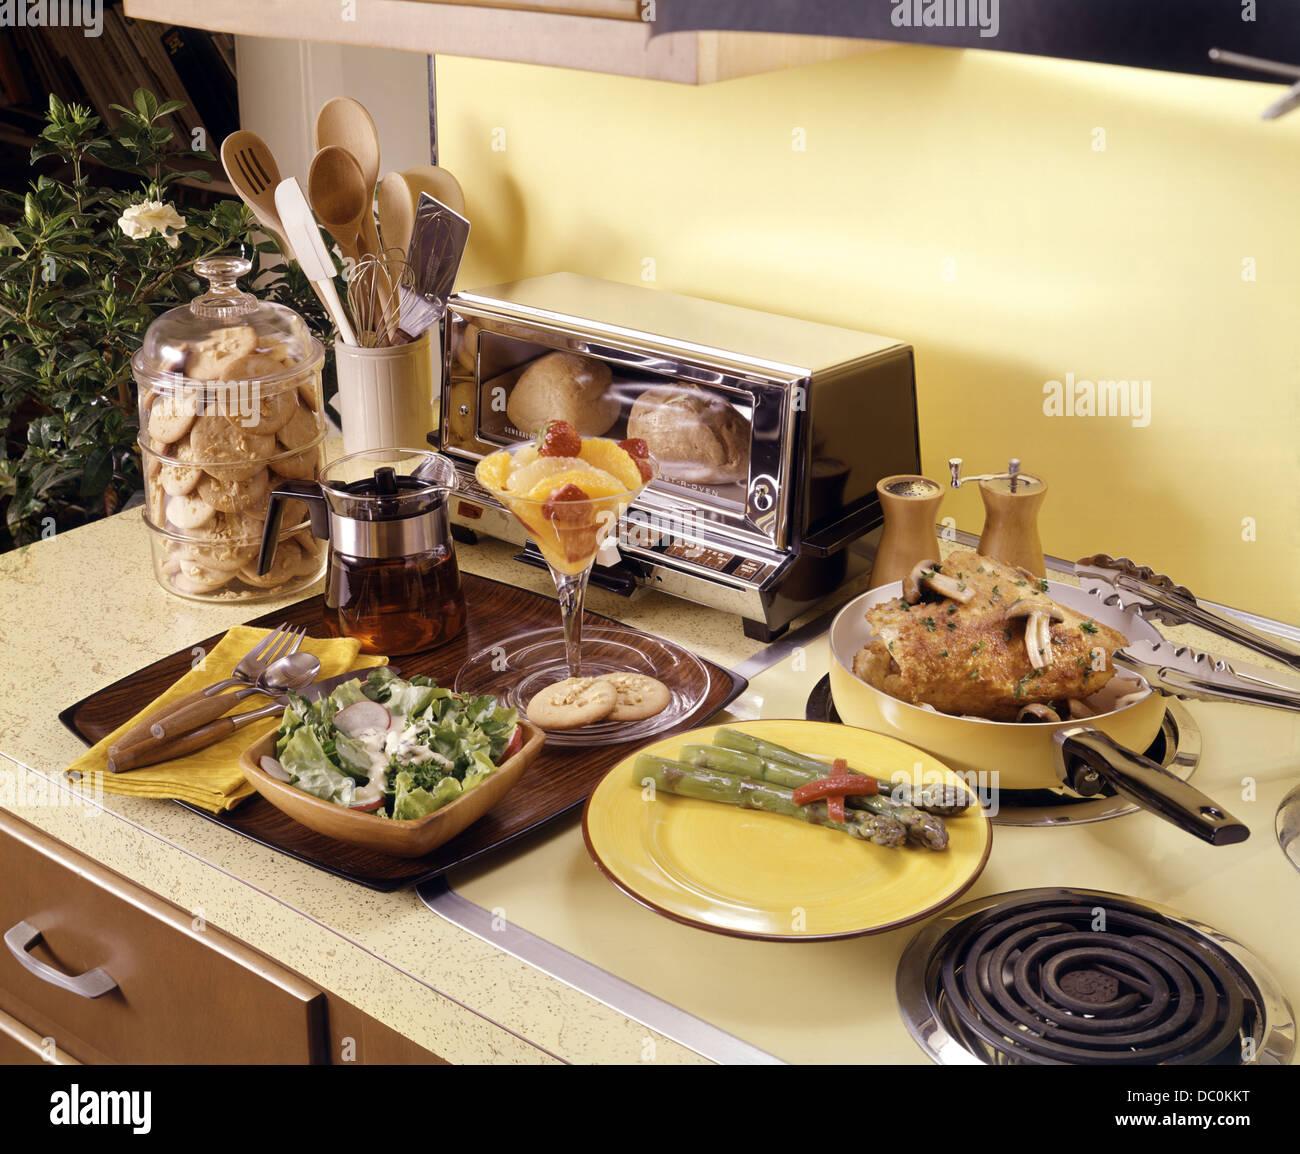 1960s 1970s meal prepared with kitchen appliances chicken potato salad asparagus tea fruit cocktail cookies 1960s 1970s meal prepared with kitchen appliances chicken potato      rh   alamy com